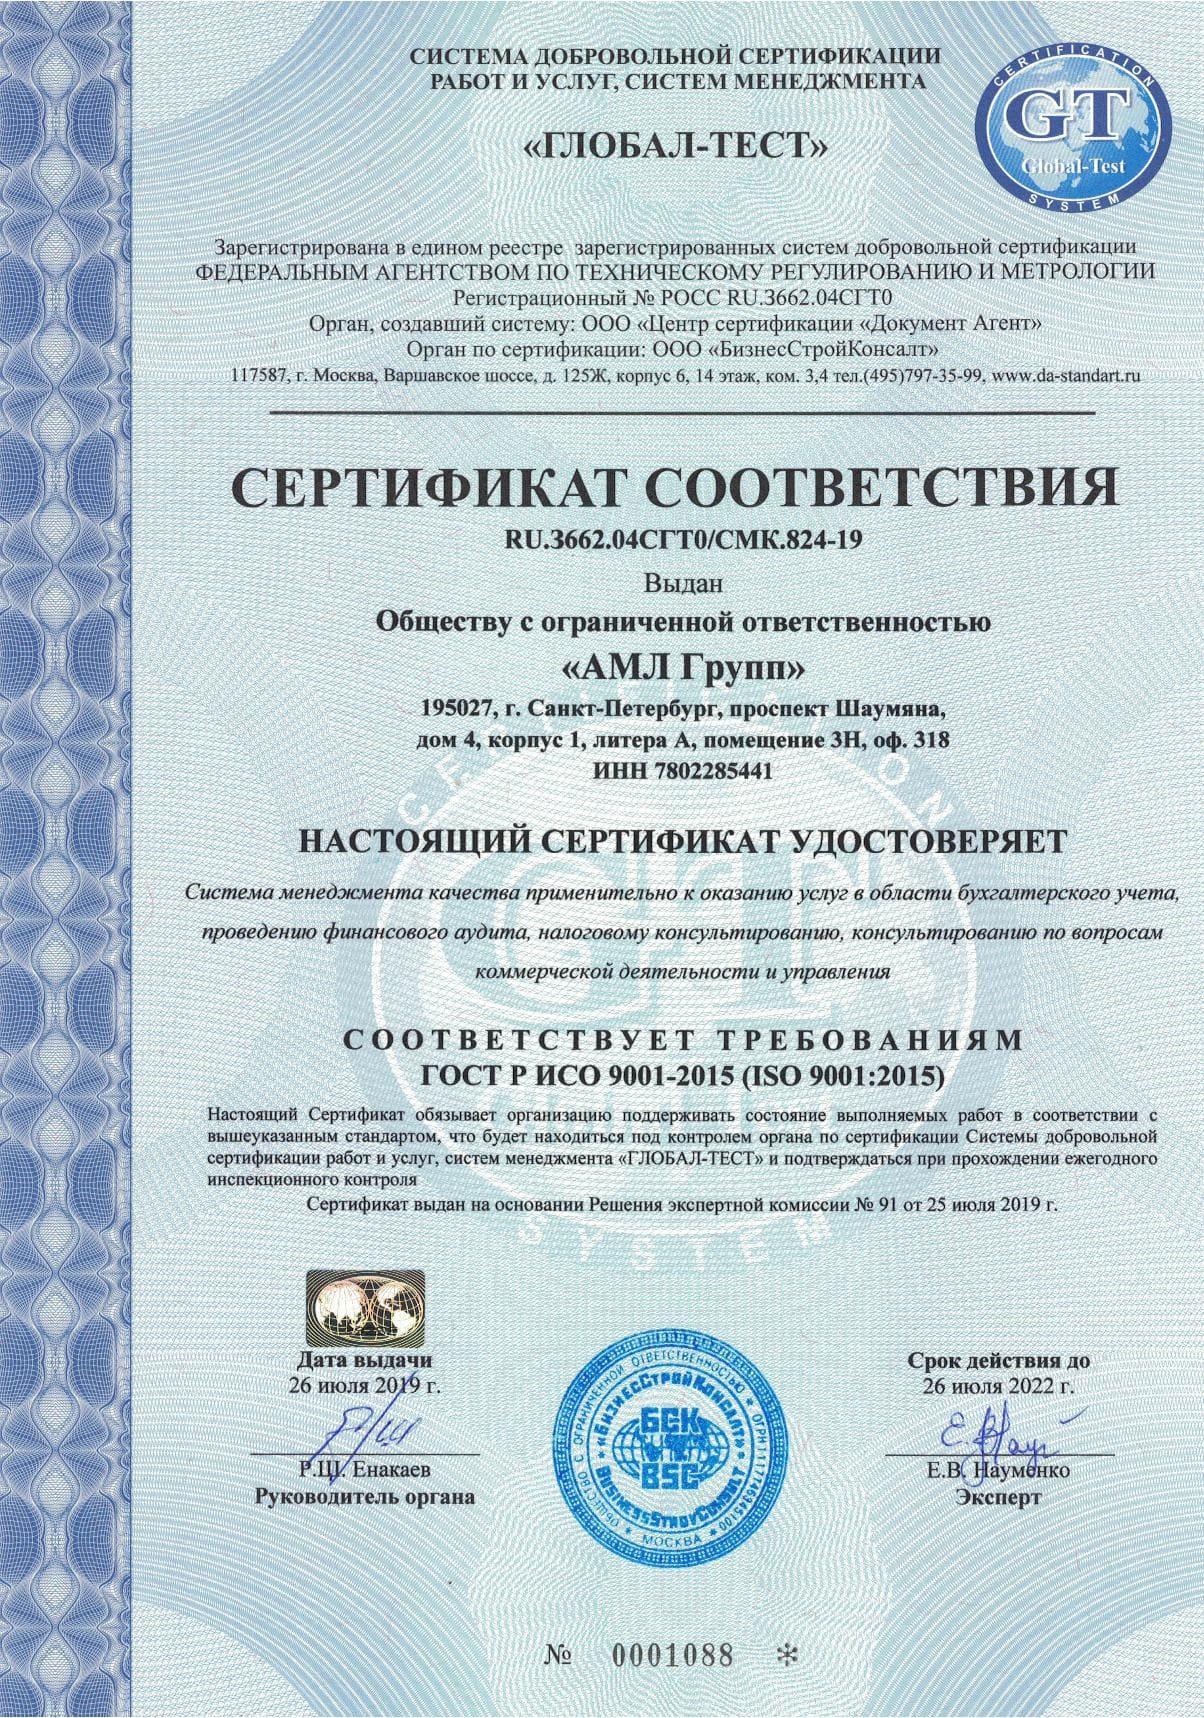 сертификат глобал-тест, глобал-тест амл групп, сертификат амл групп